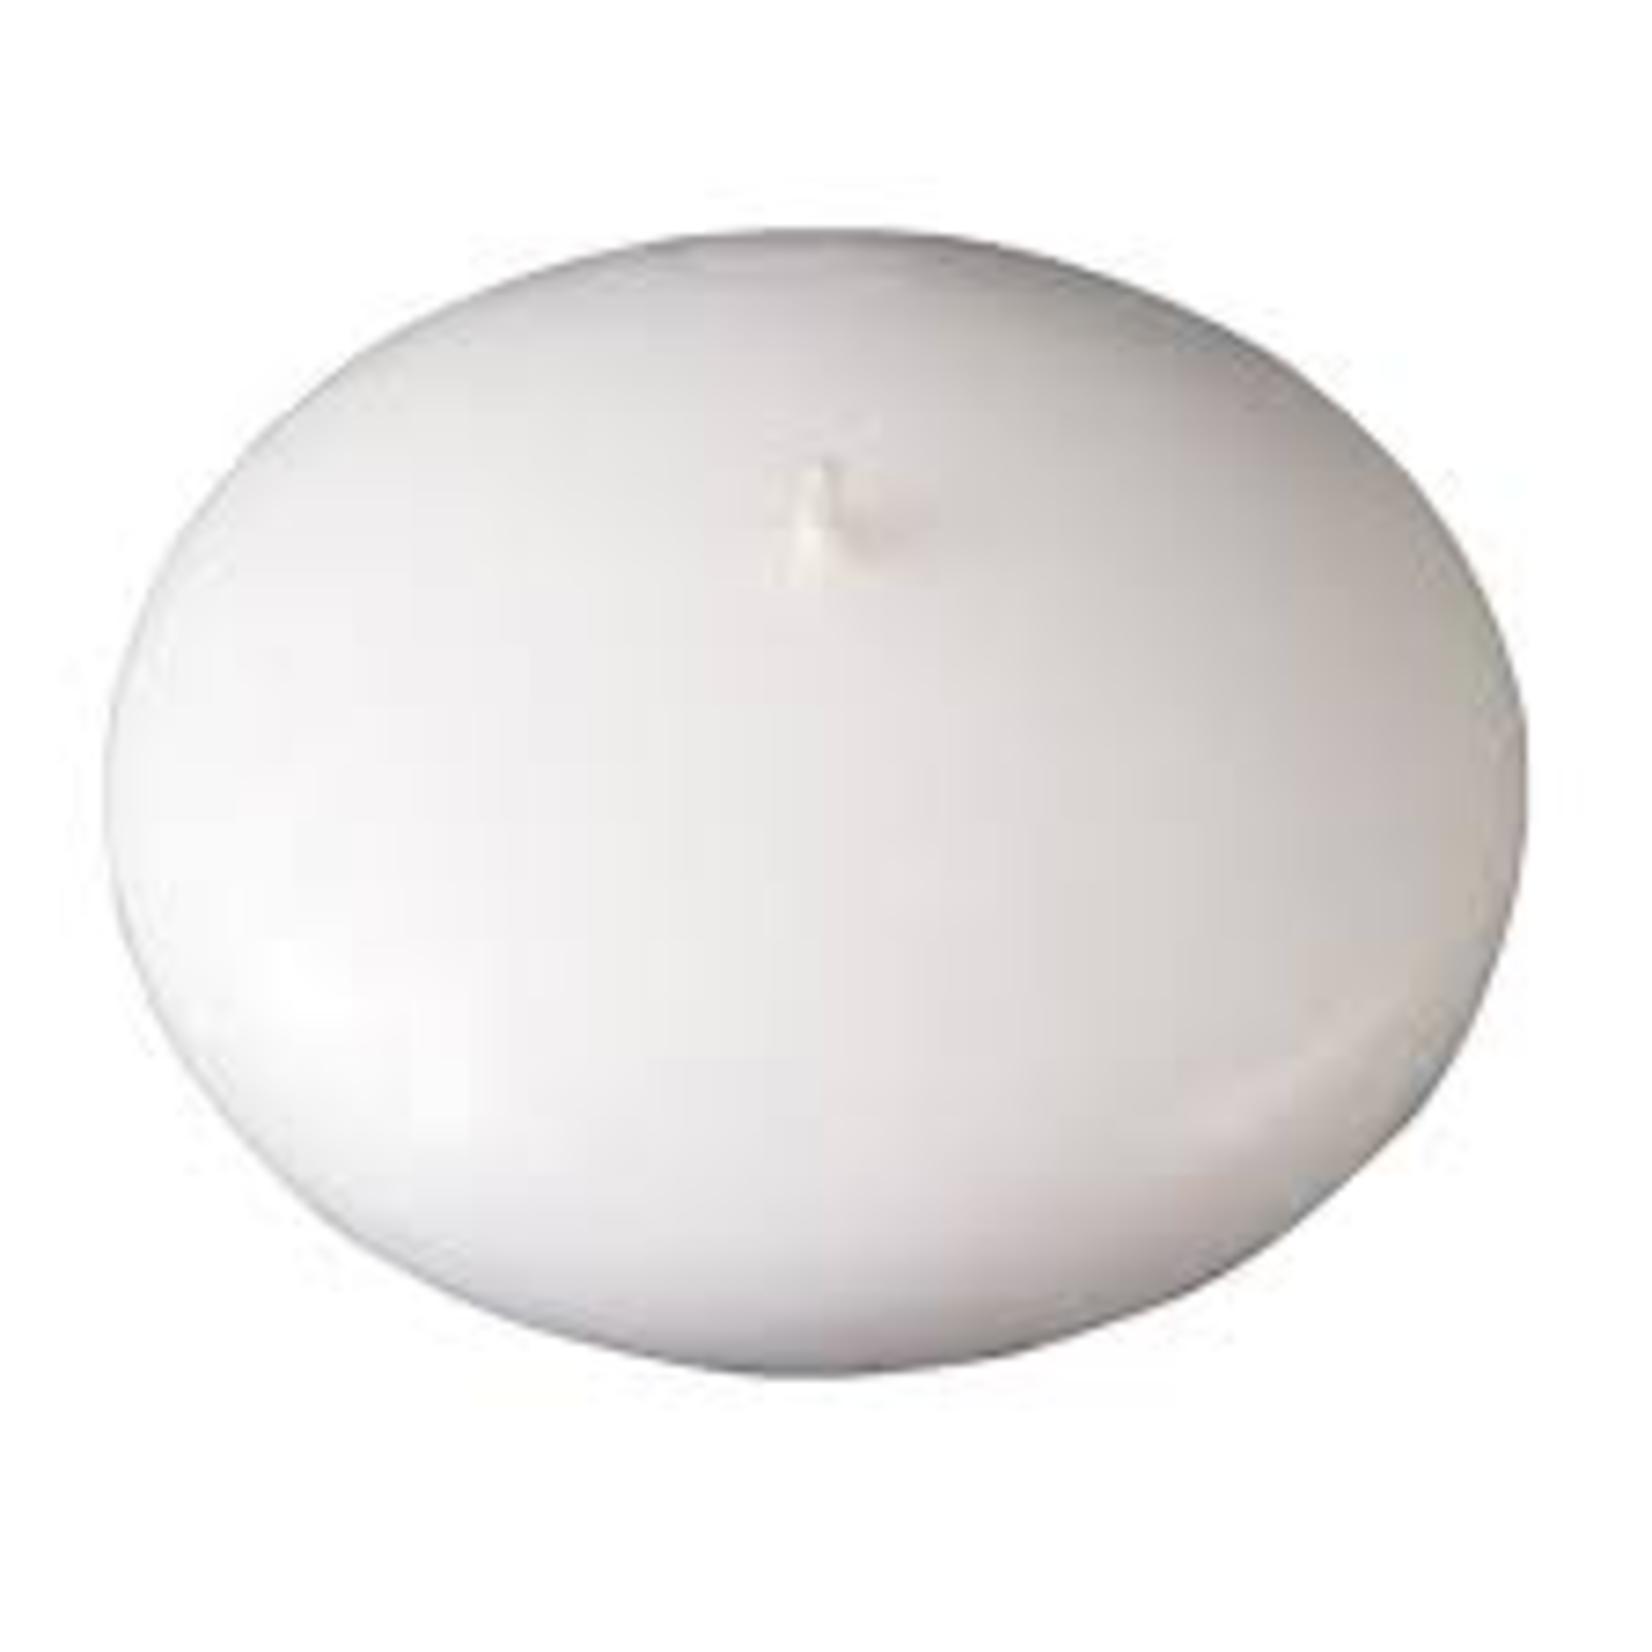 "3"" White Floating Candle"